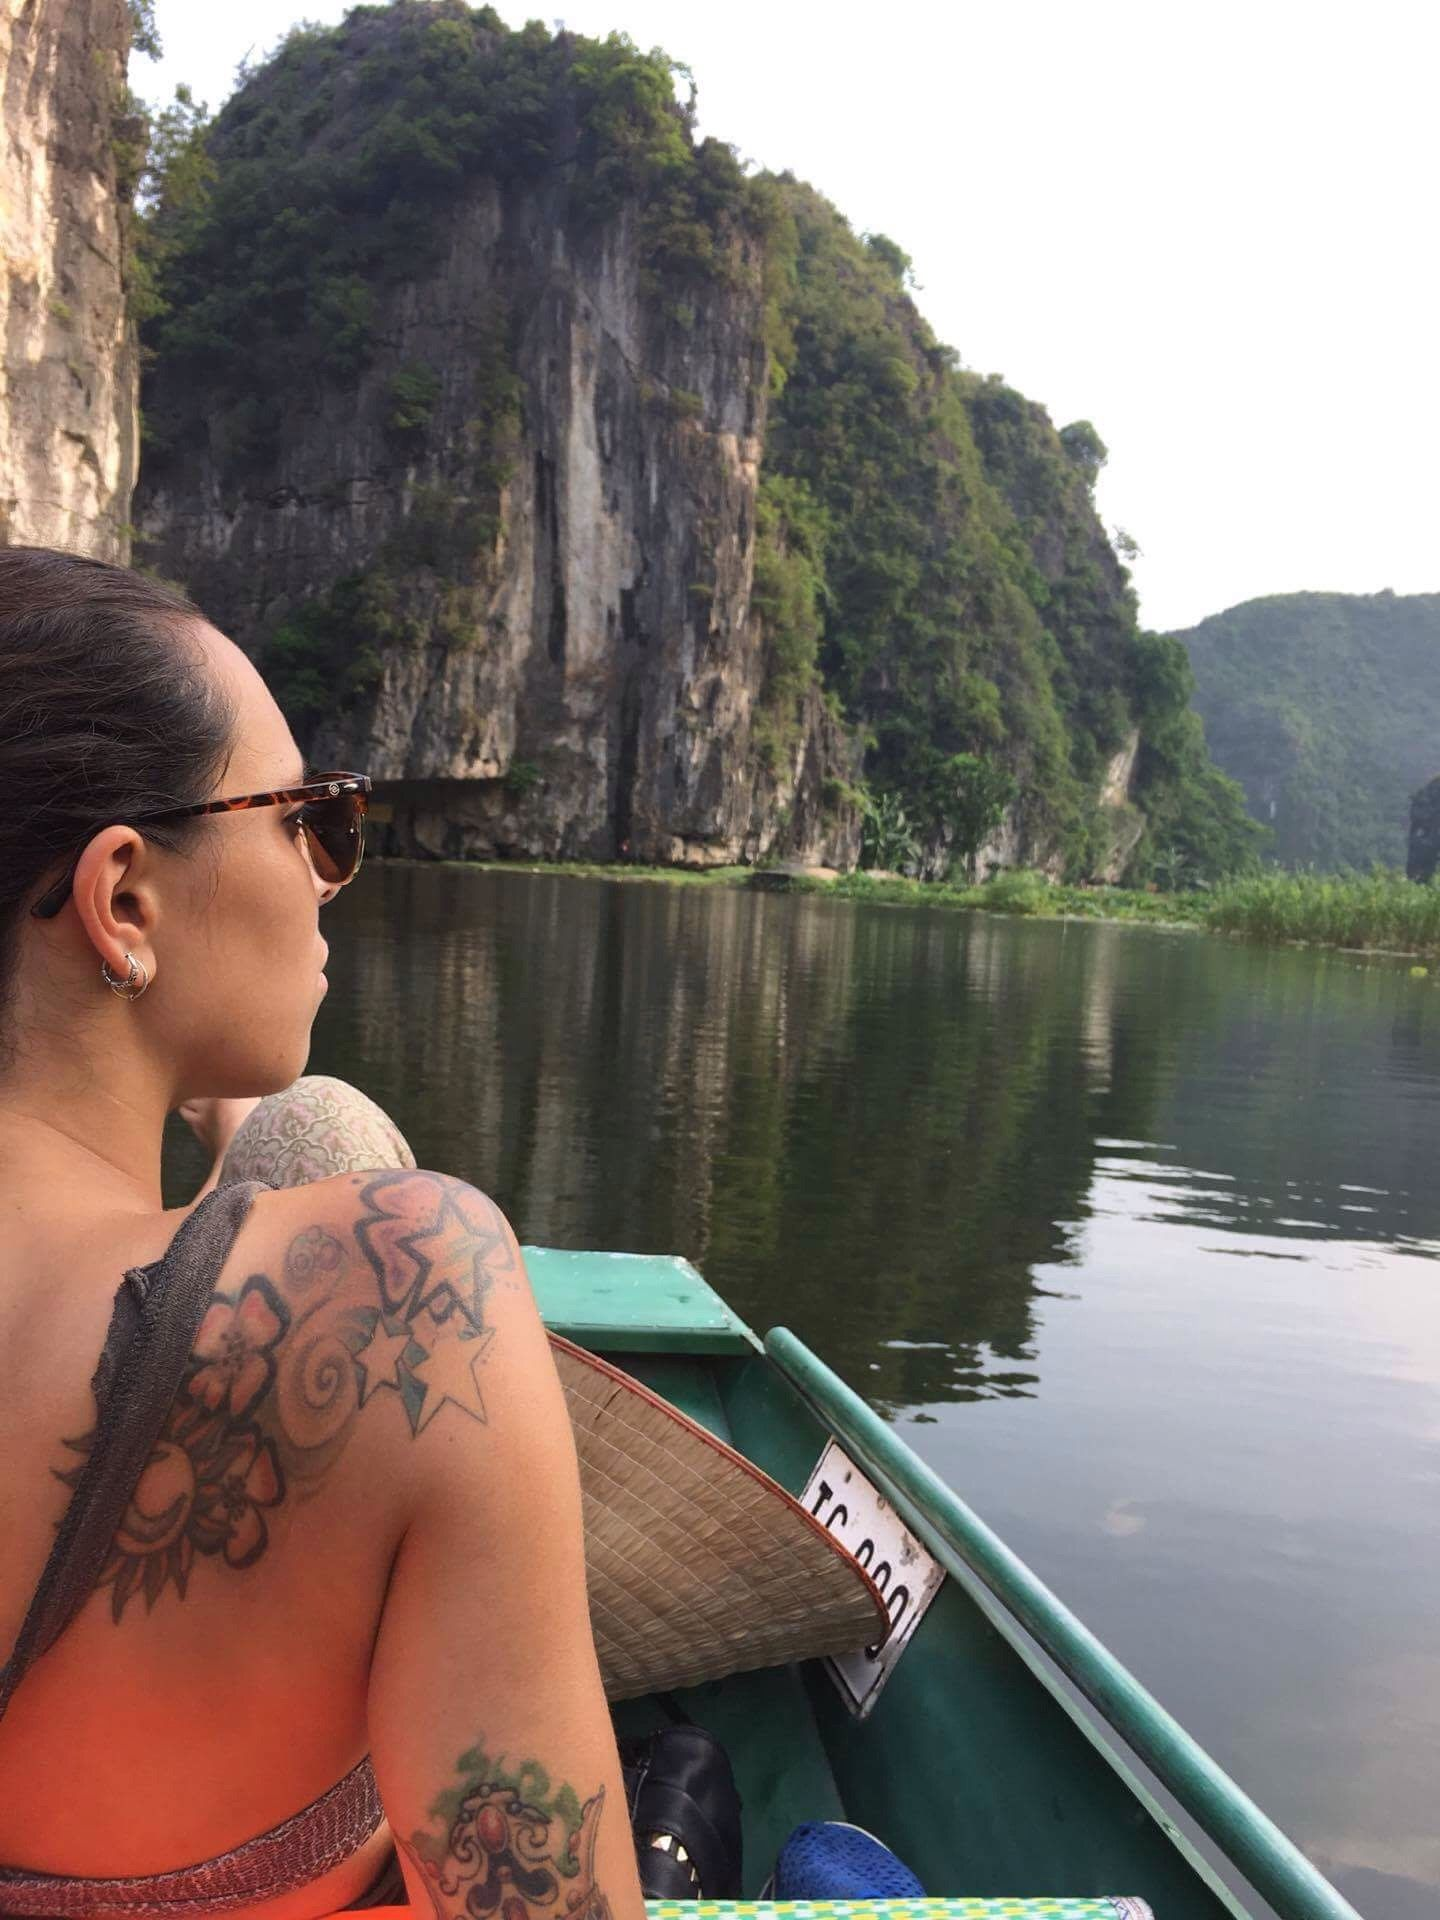 Ninh Binh boat trip, Vietnam